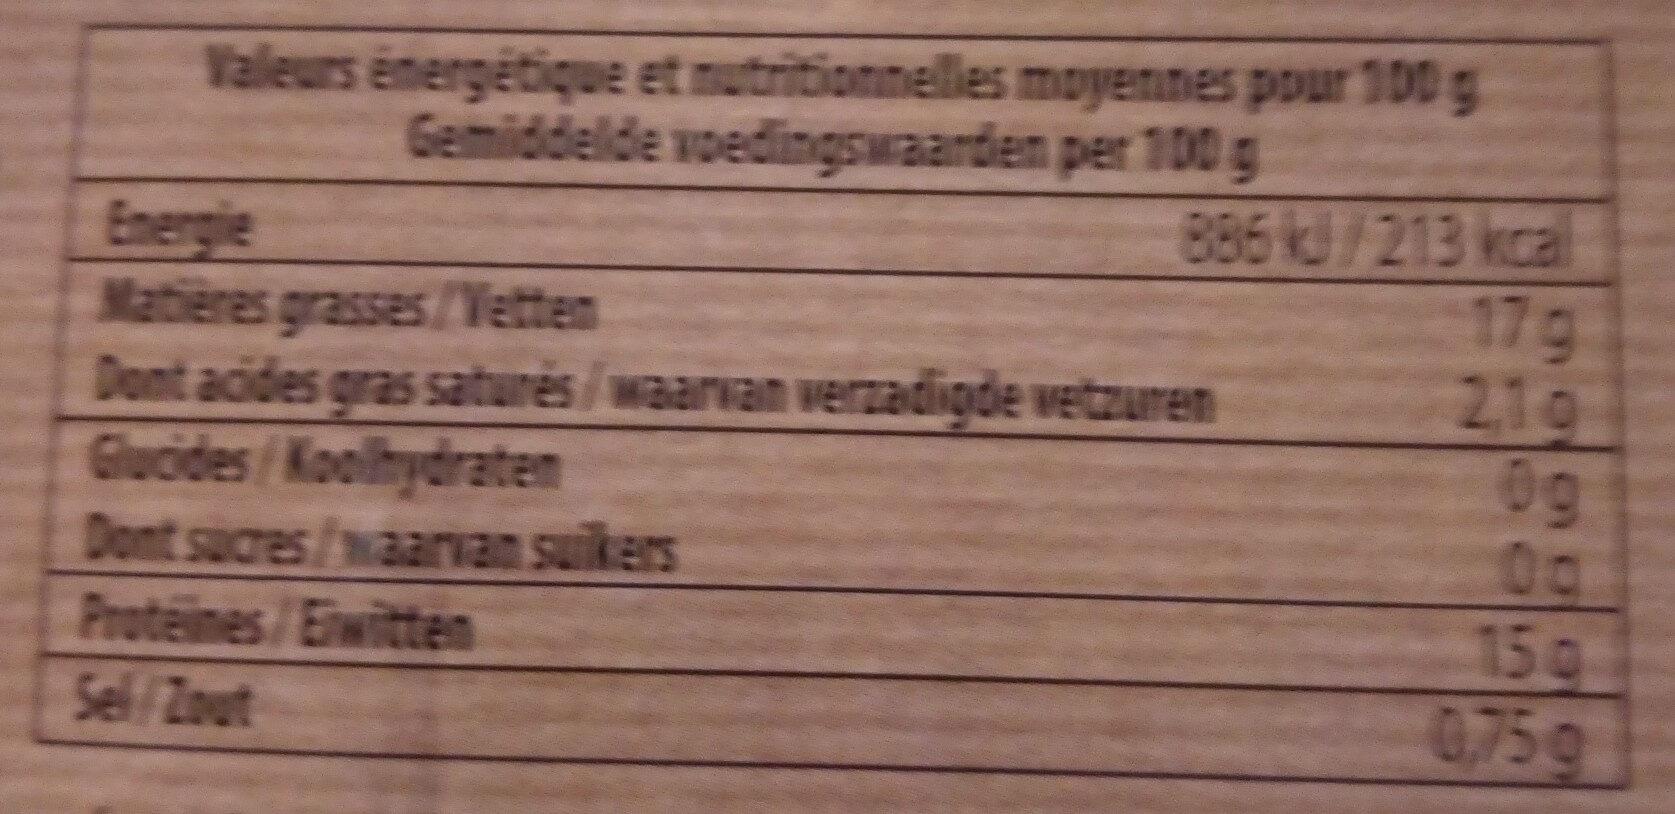 Miettes de Thon à la Sauce Tomate - Valori nutrizionali - fr